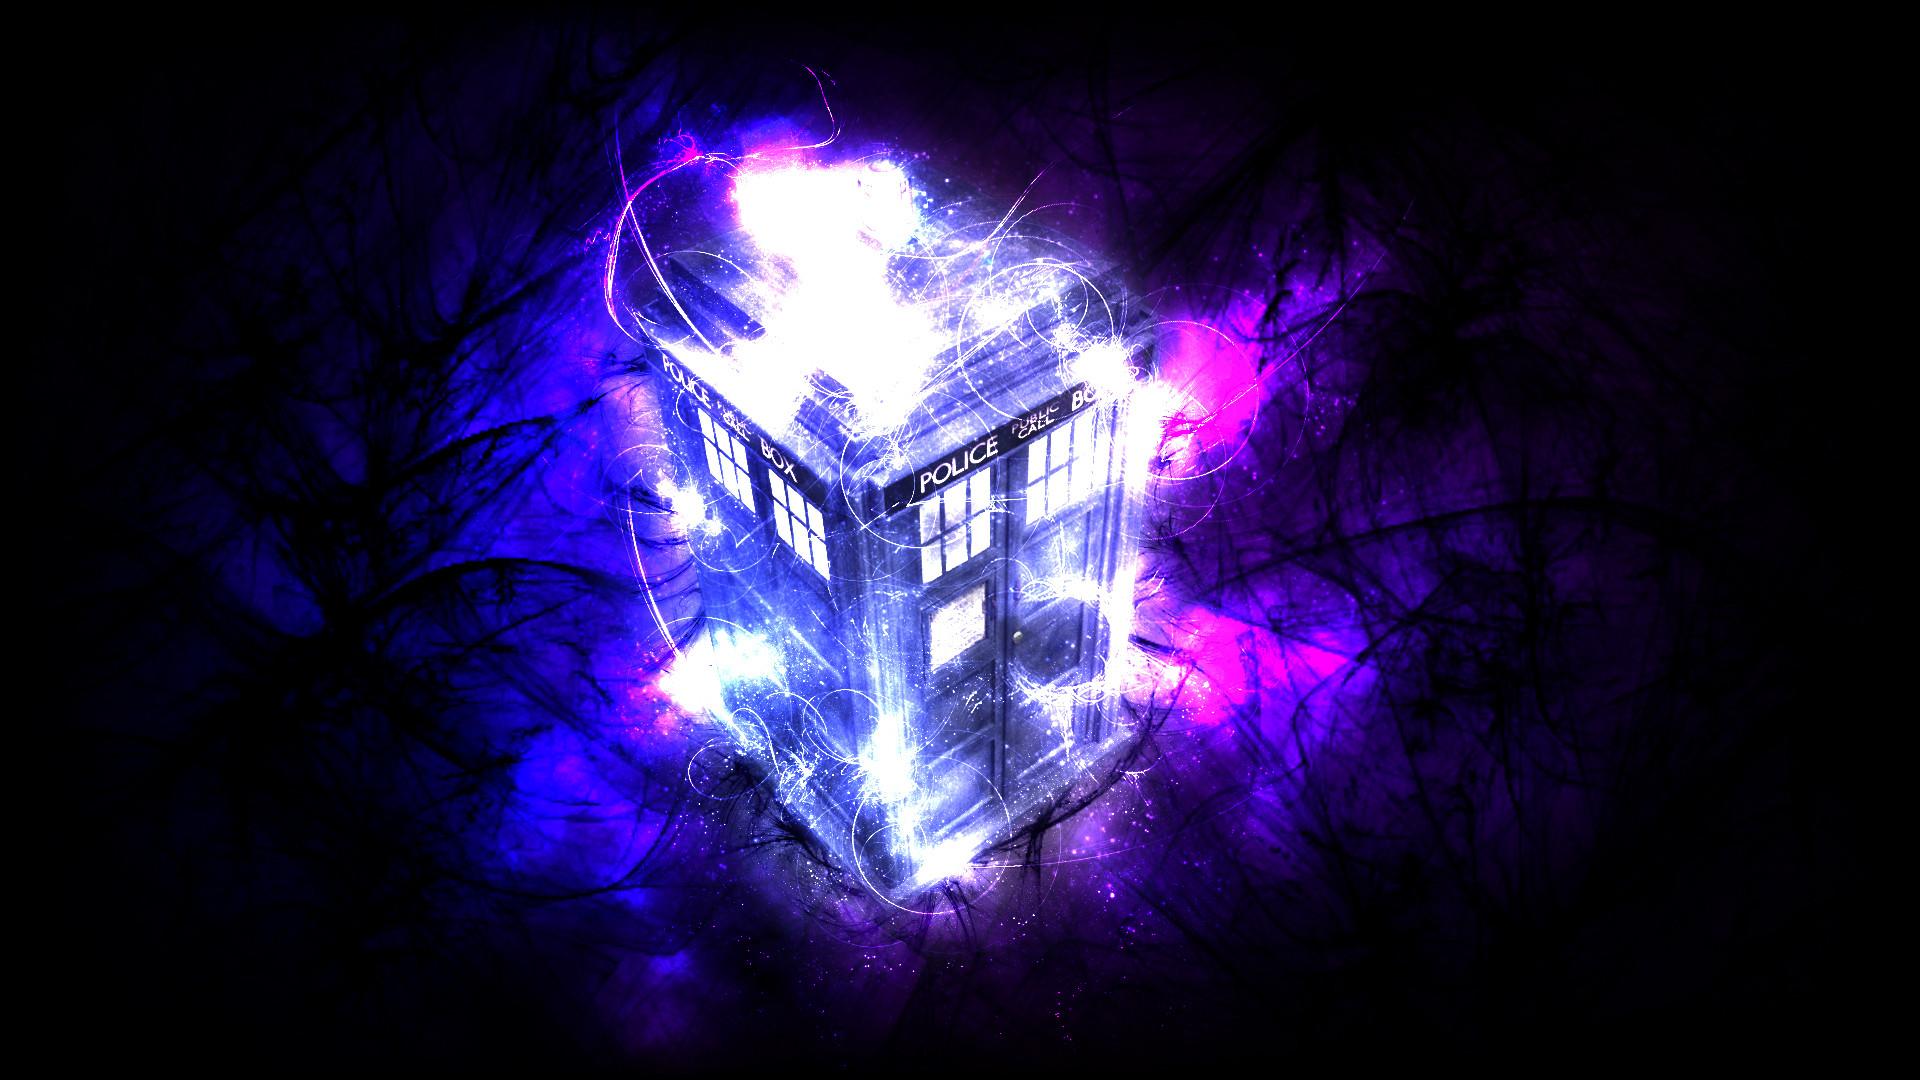 Doctor Who Tardis Matt Smith Desktop Hd Wallpaper CloudPix | HD Wallpapers  | Pinterest | Matt smith, Hd wallpaper and Wallpaper